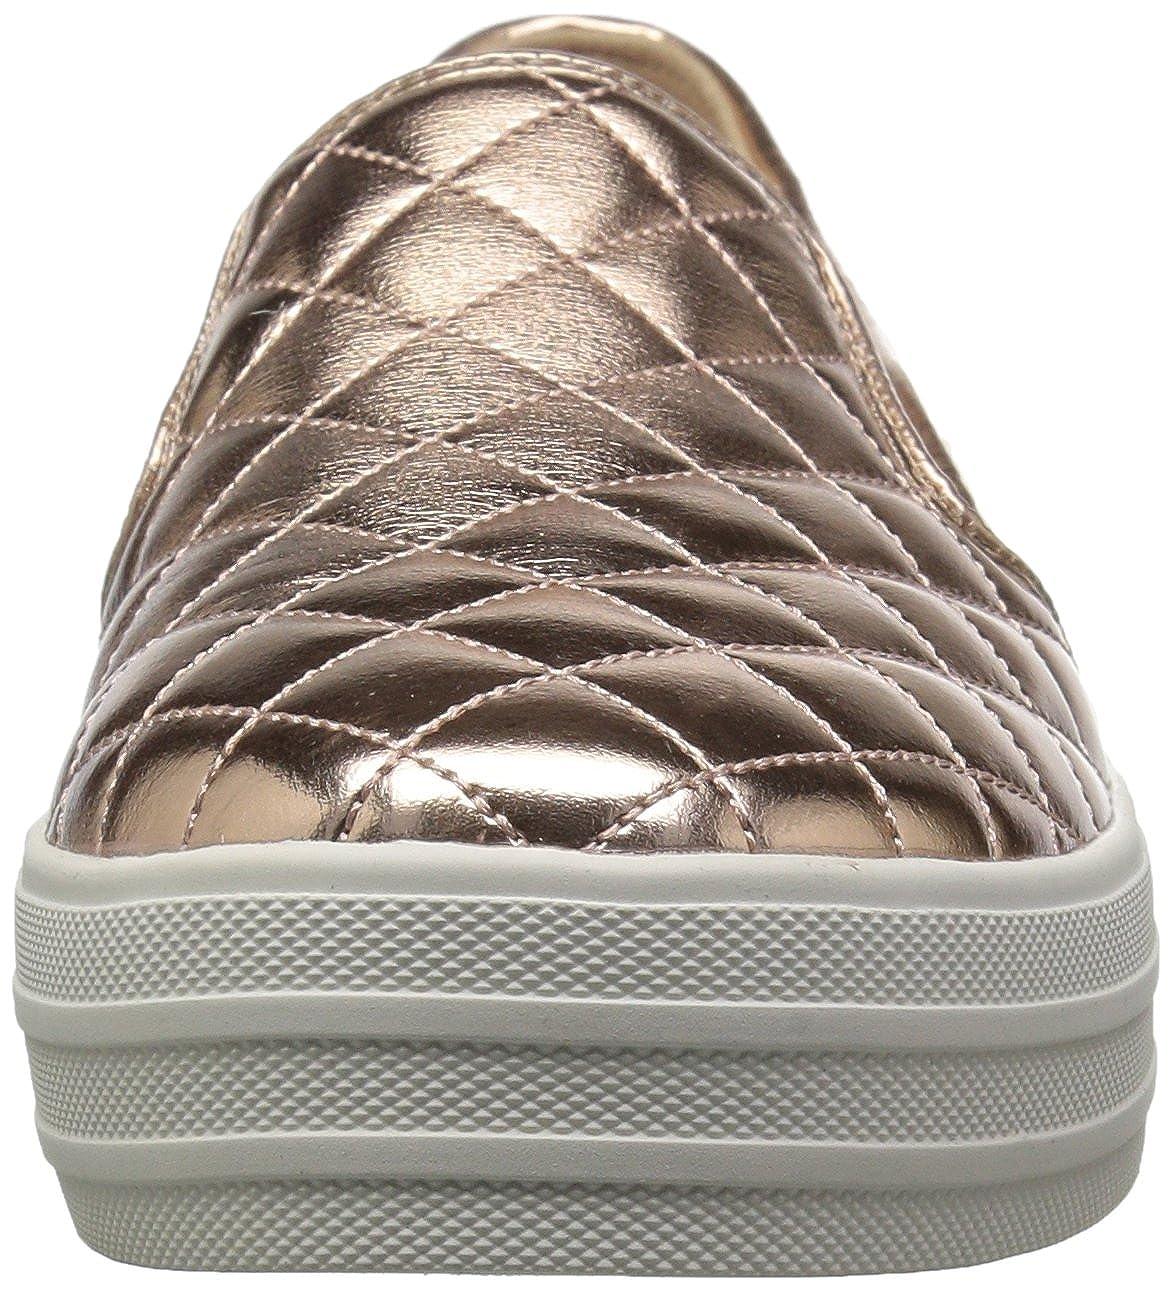 Skechers Damen Double up-Duvet Slip on Sneaker, Silber (Silver), 35.5 EU